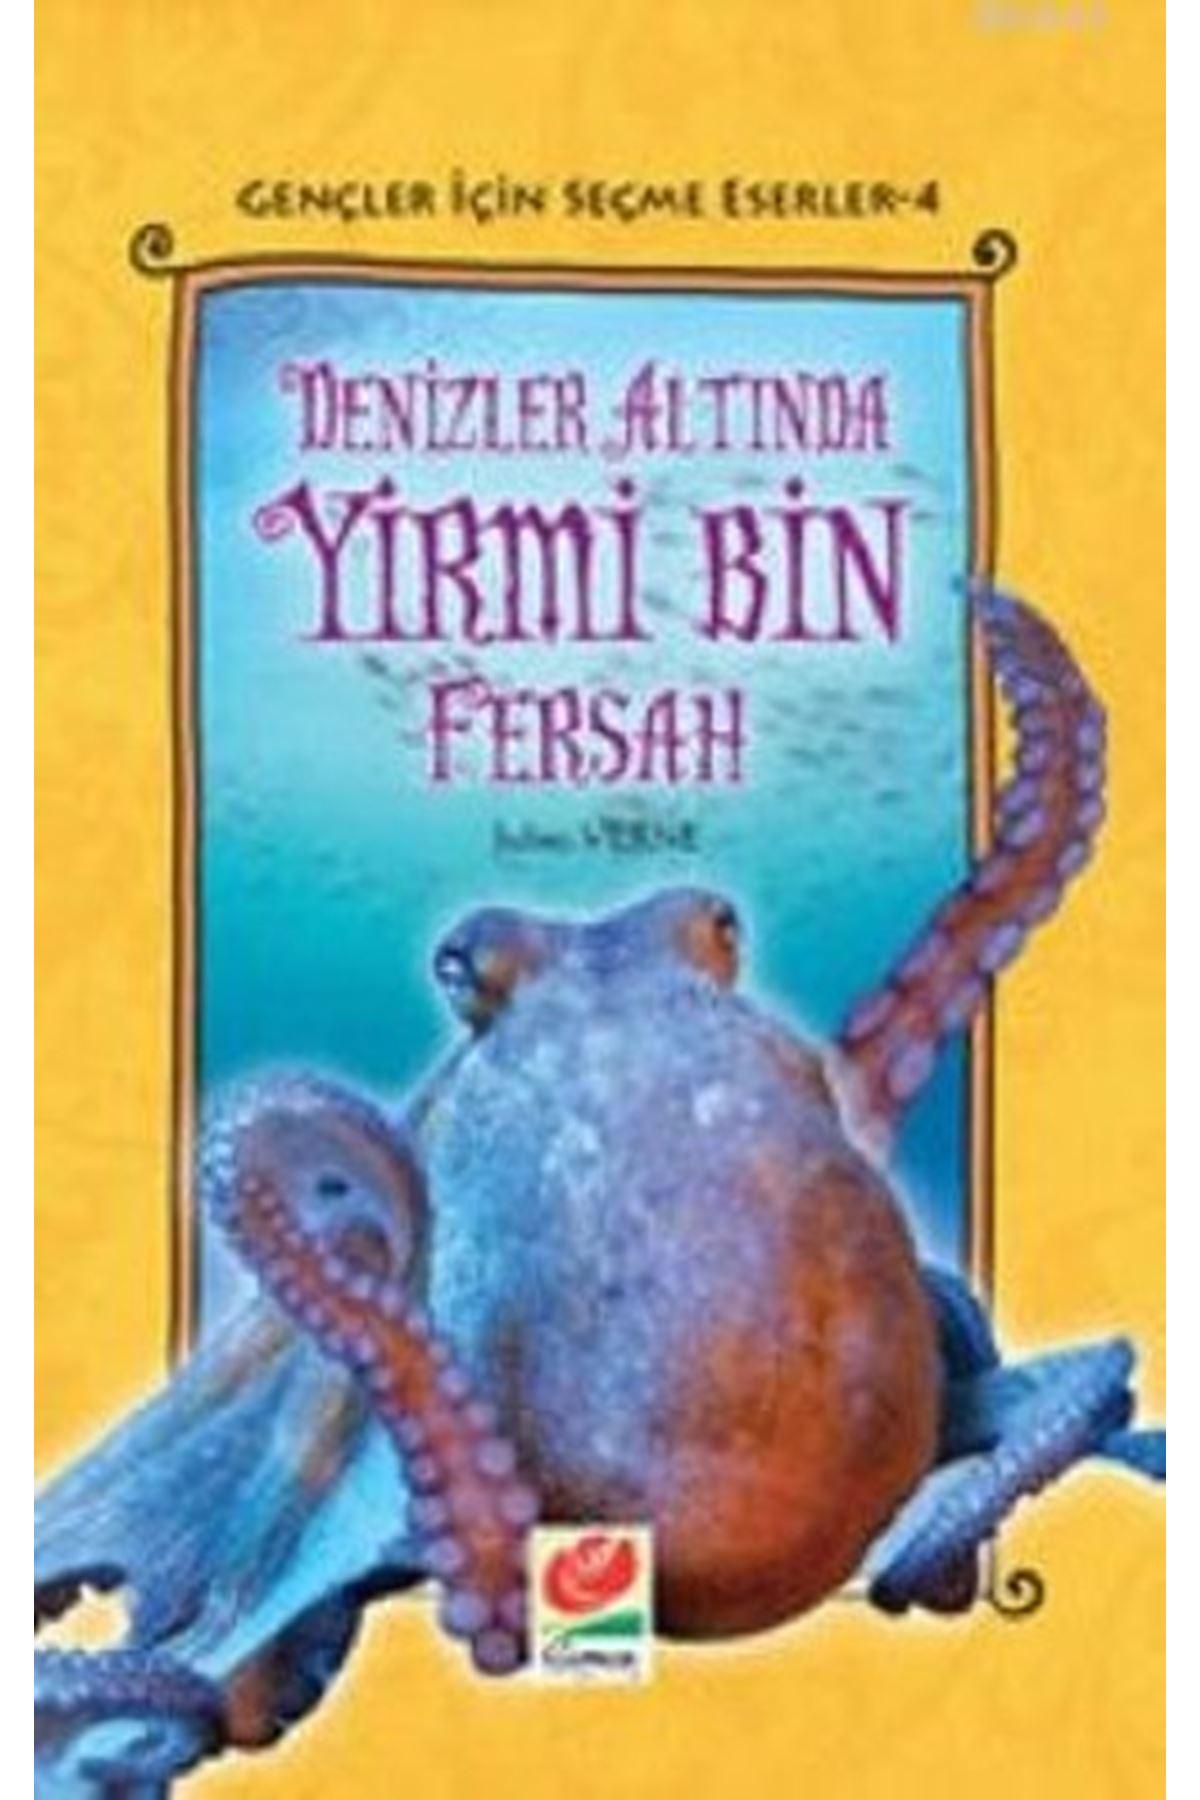 JULİES VERNE - DENİZLER ALTINDA YİRMİ BİN FERSAH